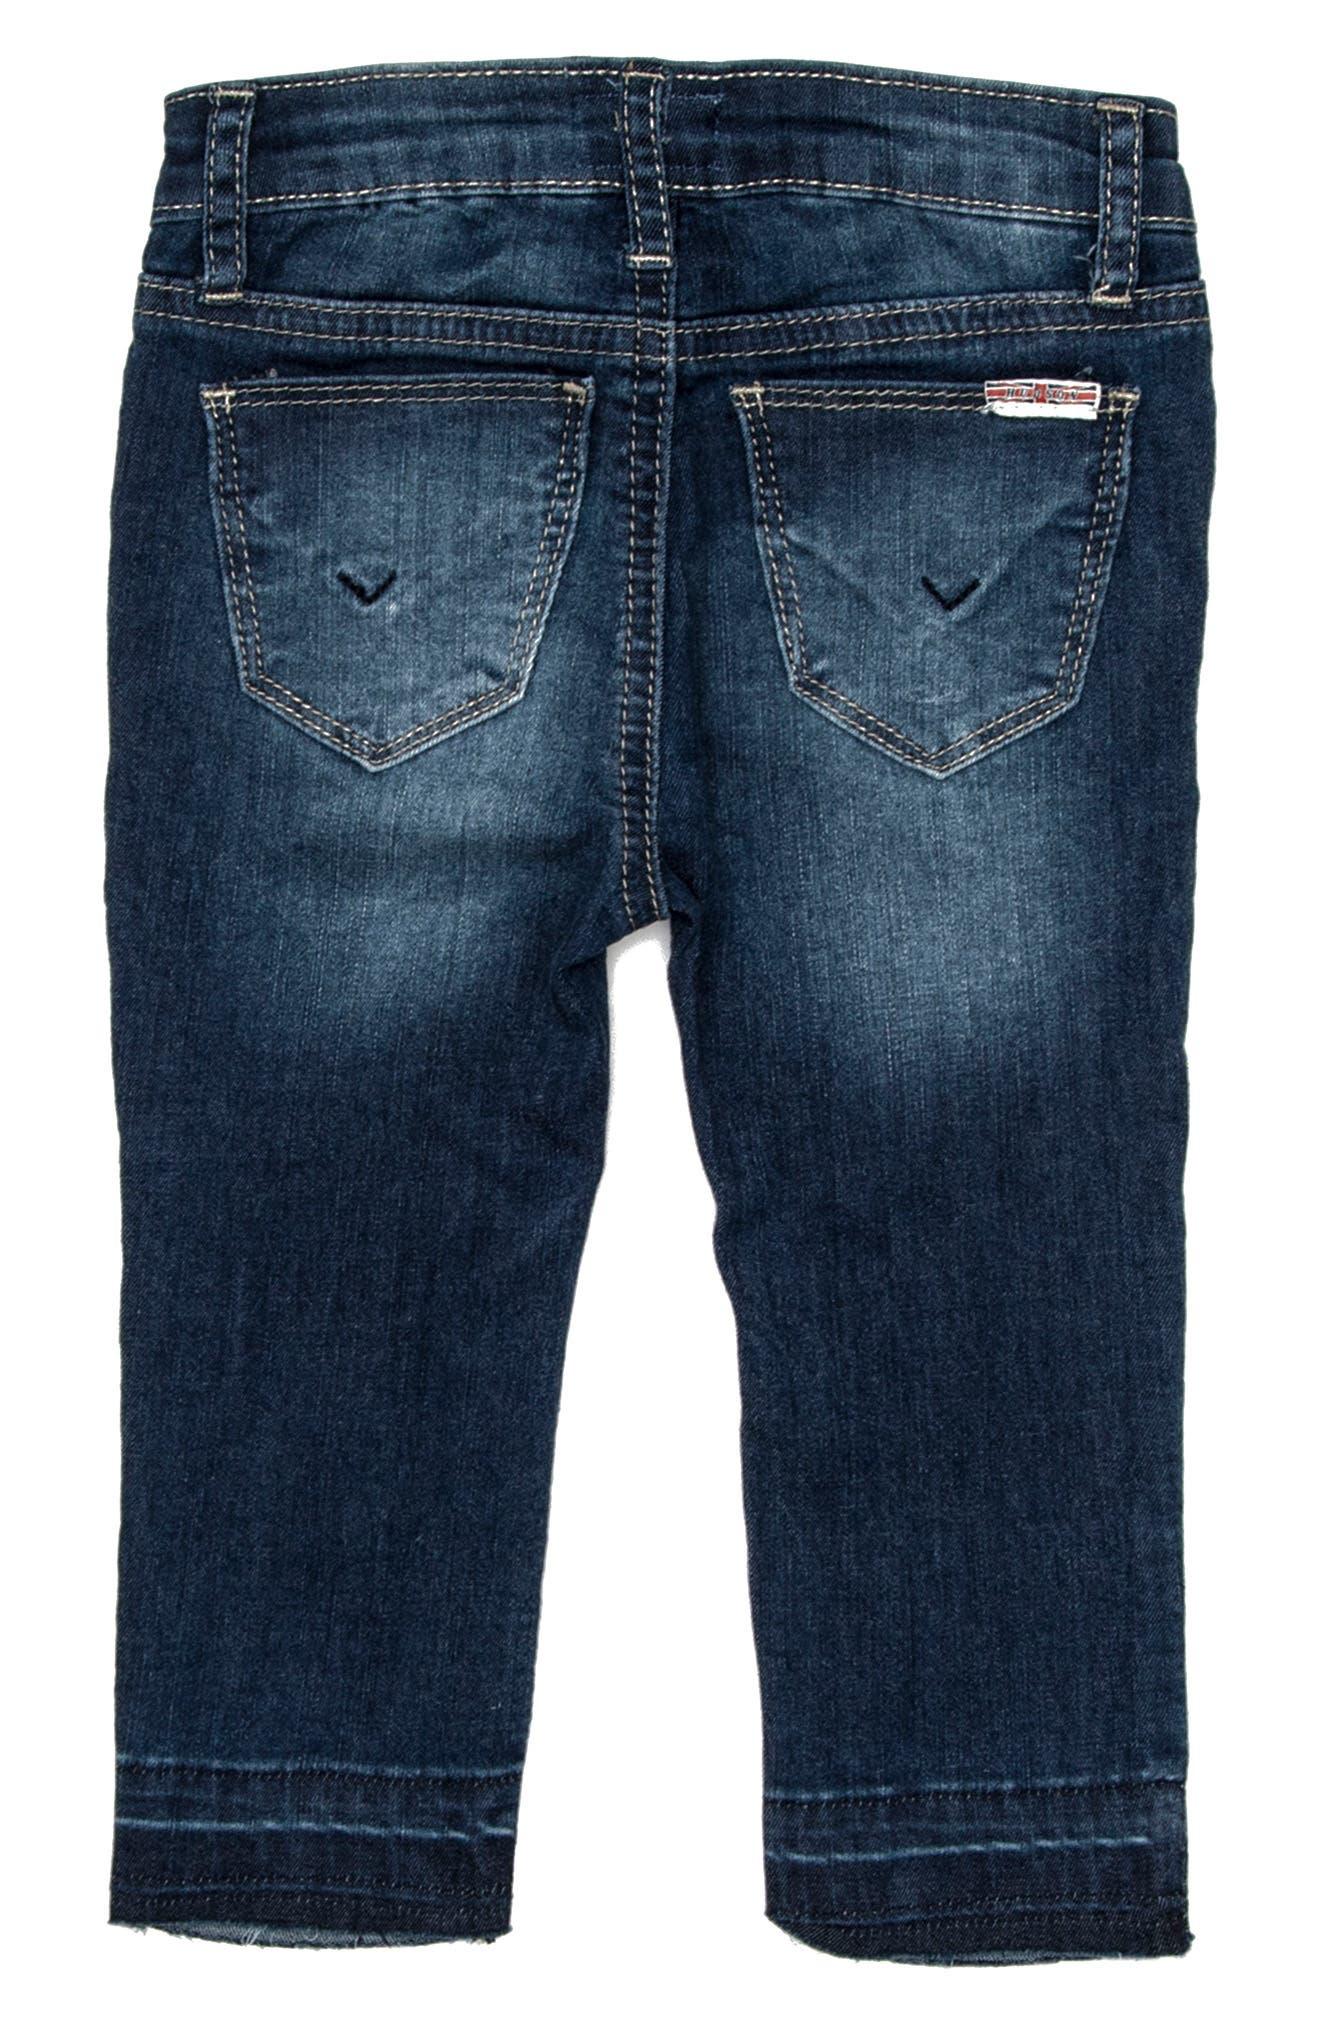 Alternate Image 2  - Hudson Kids Christa Super Stretch Skinny Jeans (Baby Girls)